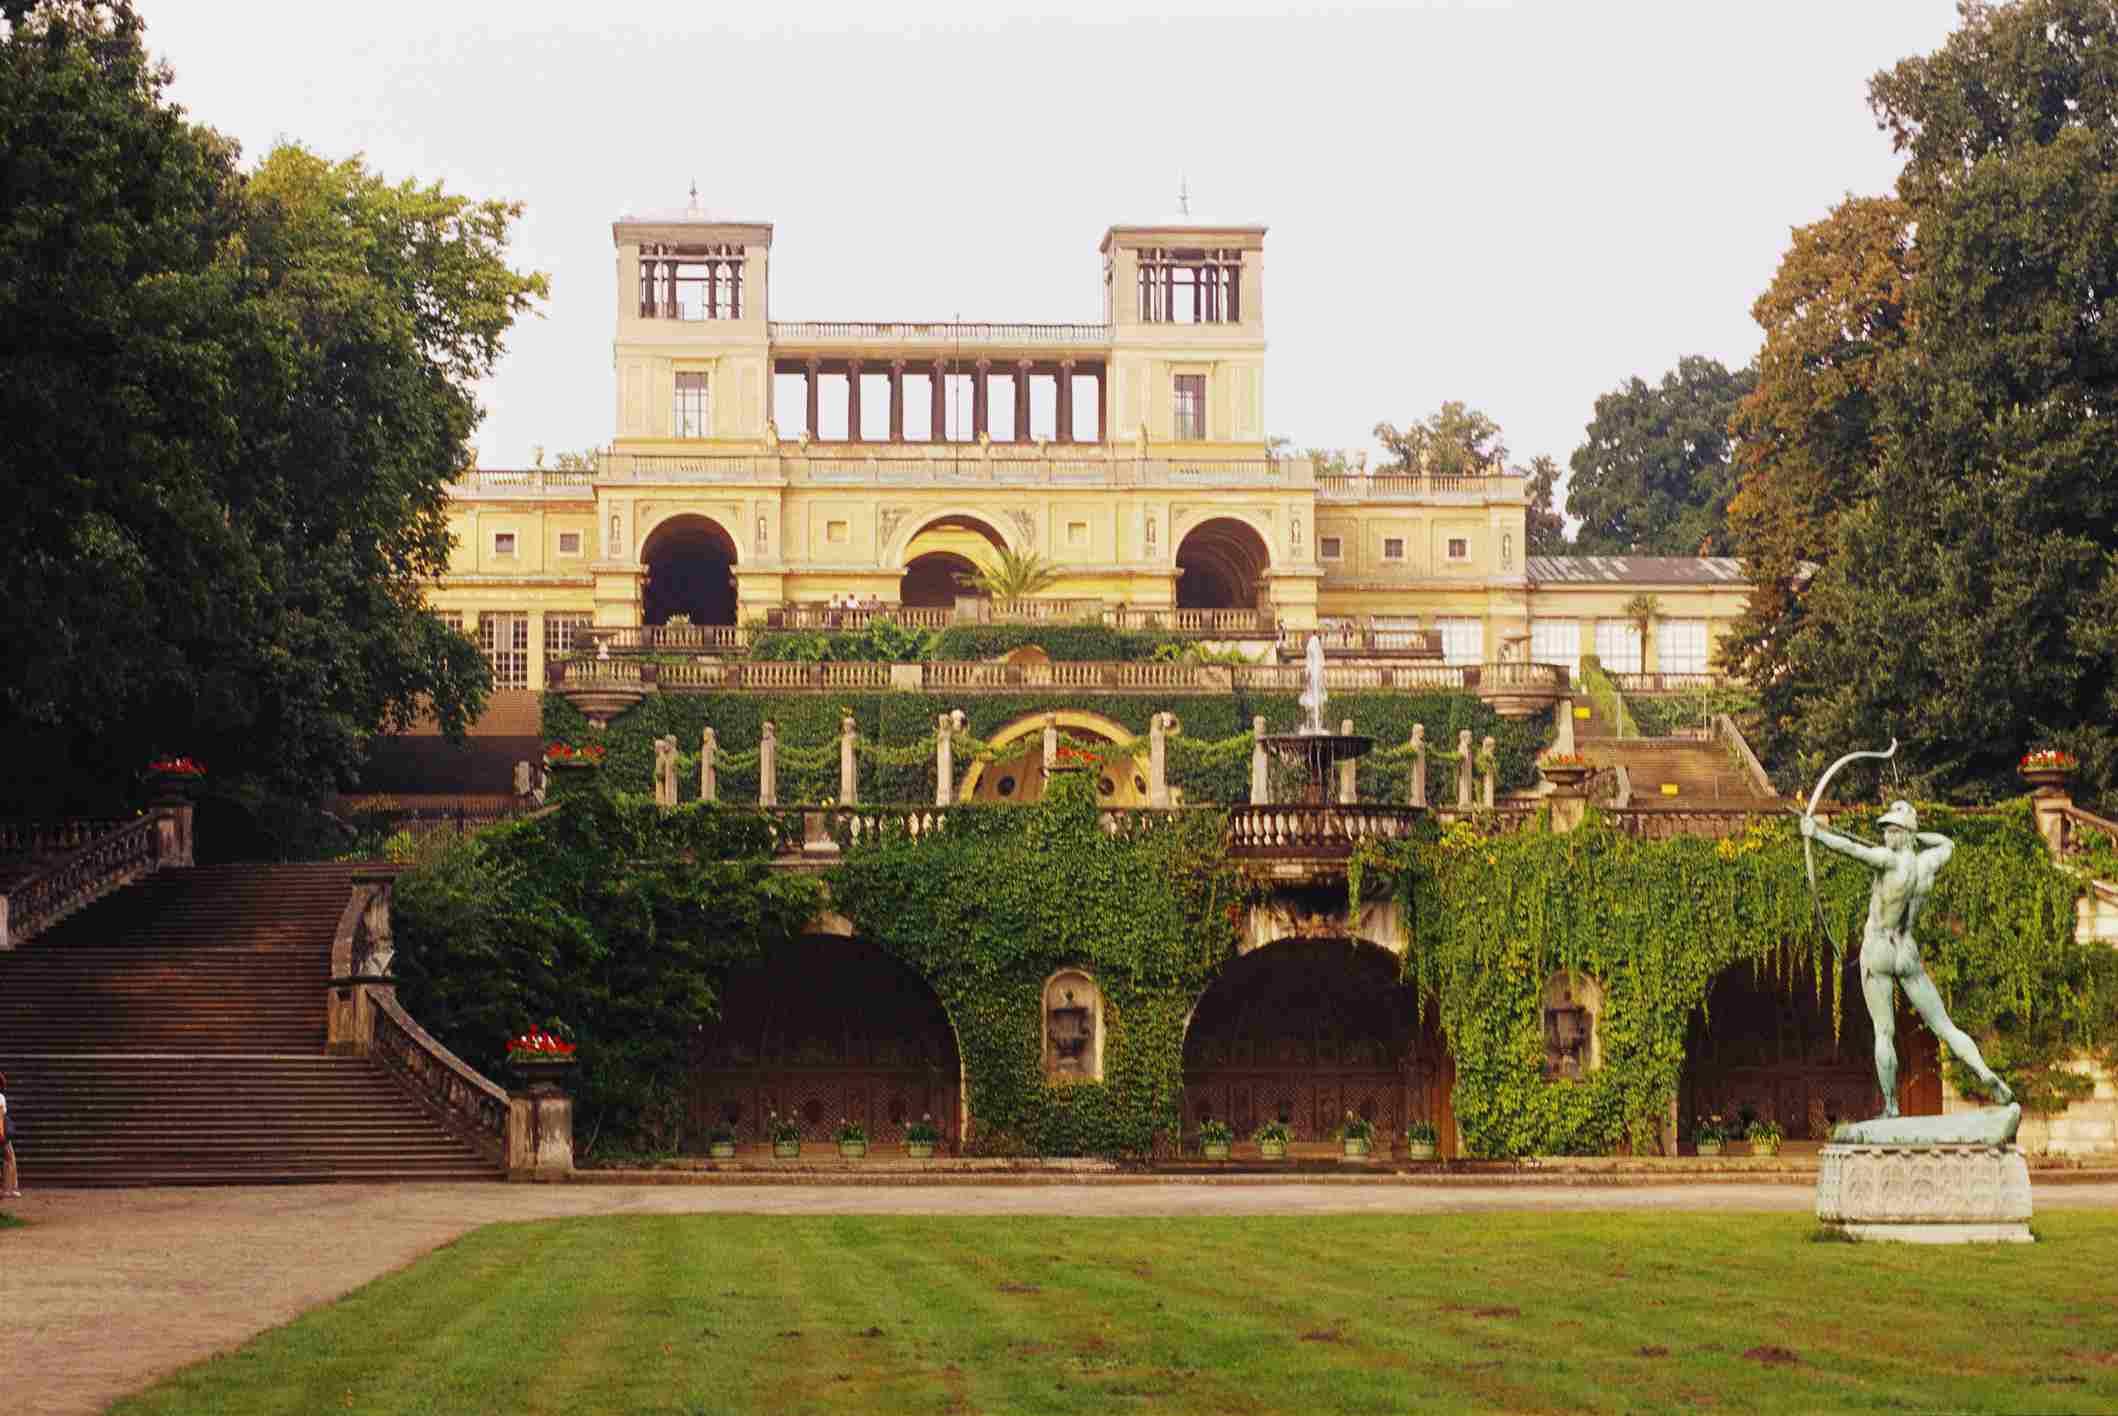 Sansoucci gardens in Potsdam